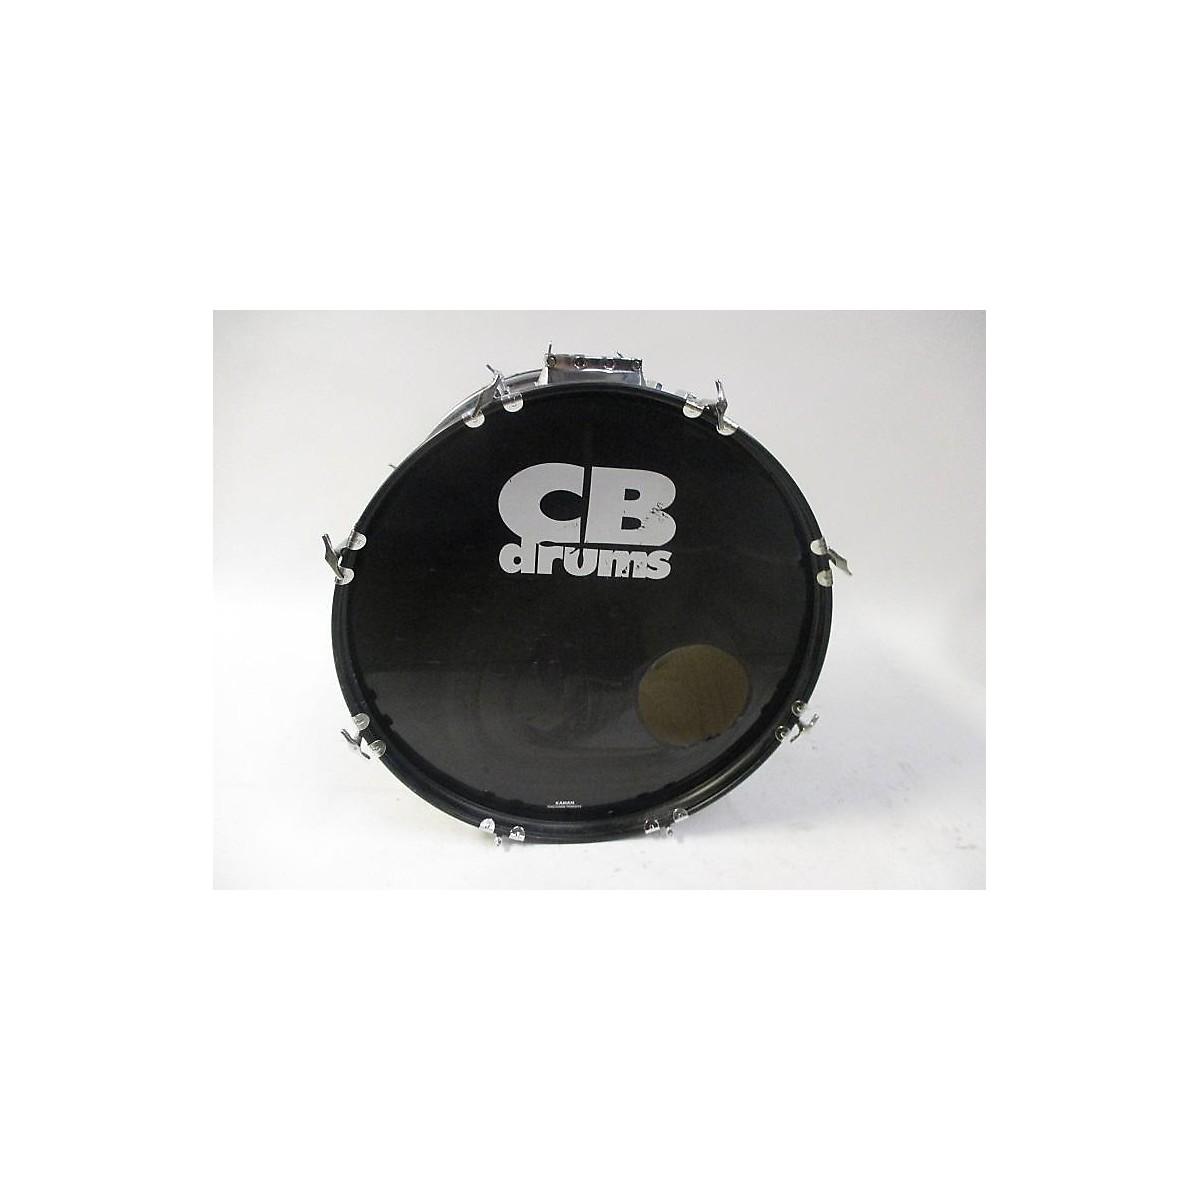 CB Percussion Maxx Sp Series Drum Kit